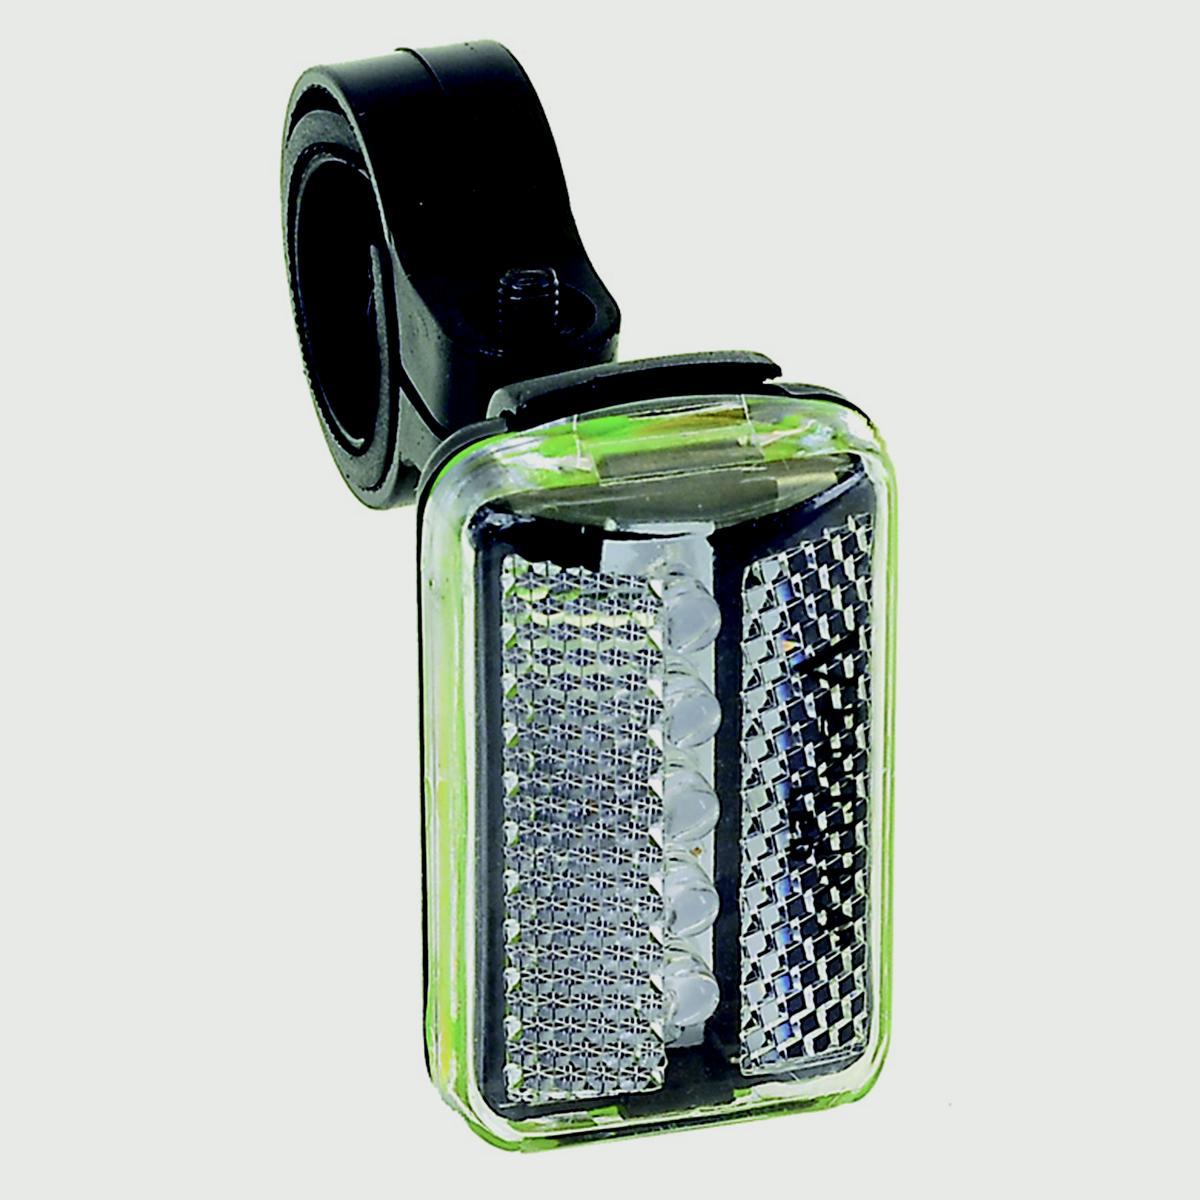 Ventura 5.2 LED Taillight